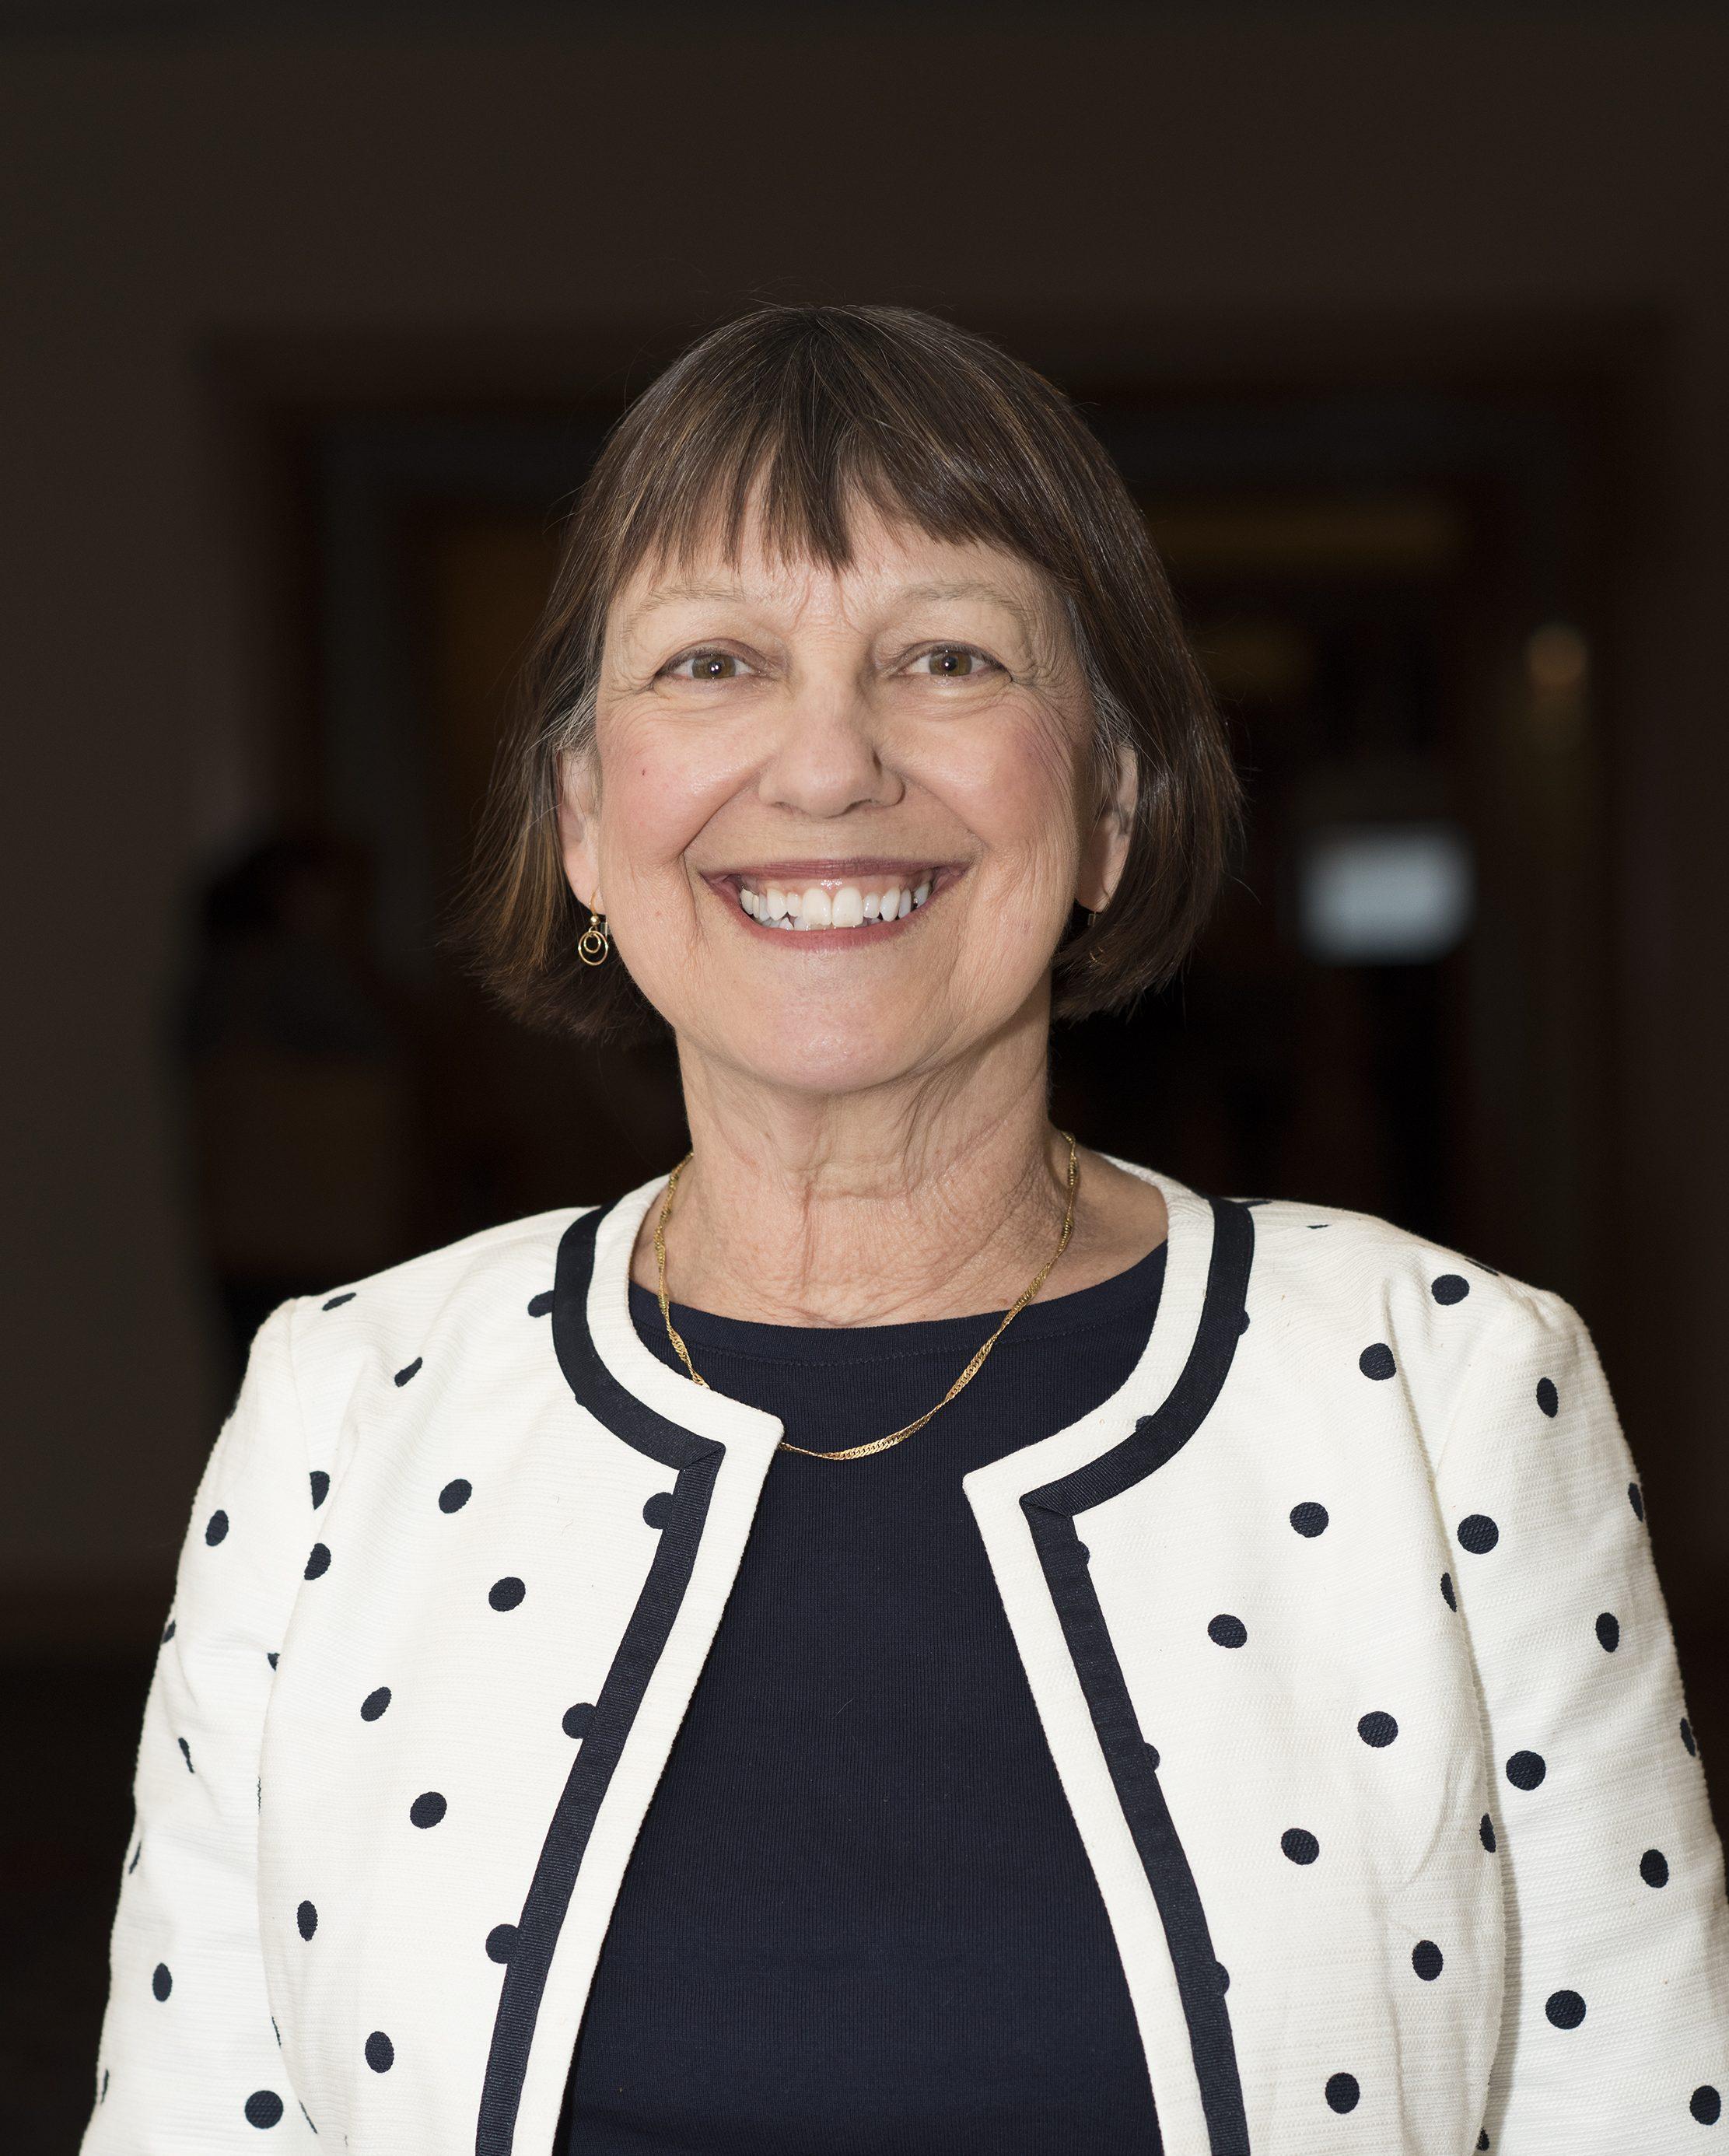 Catherine L. Troisi, PhD